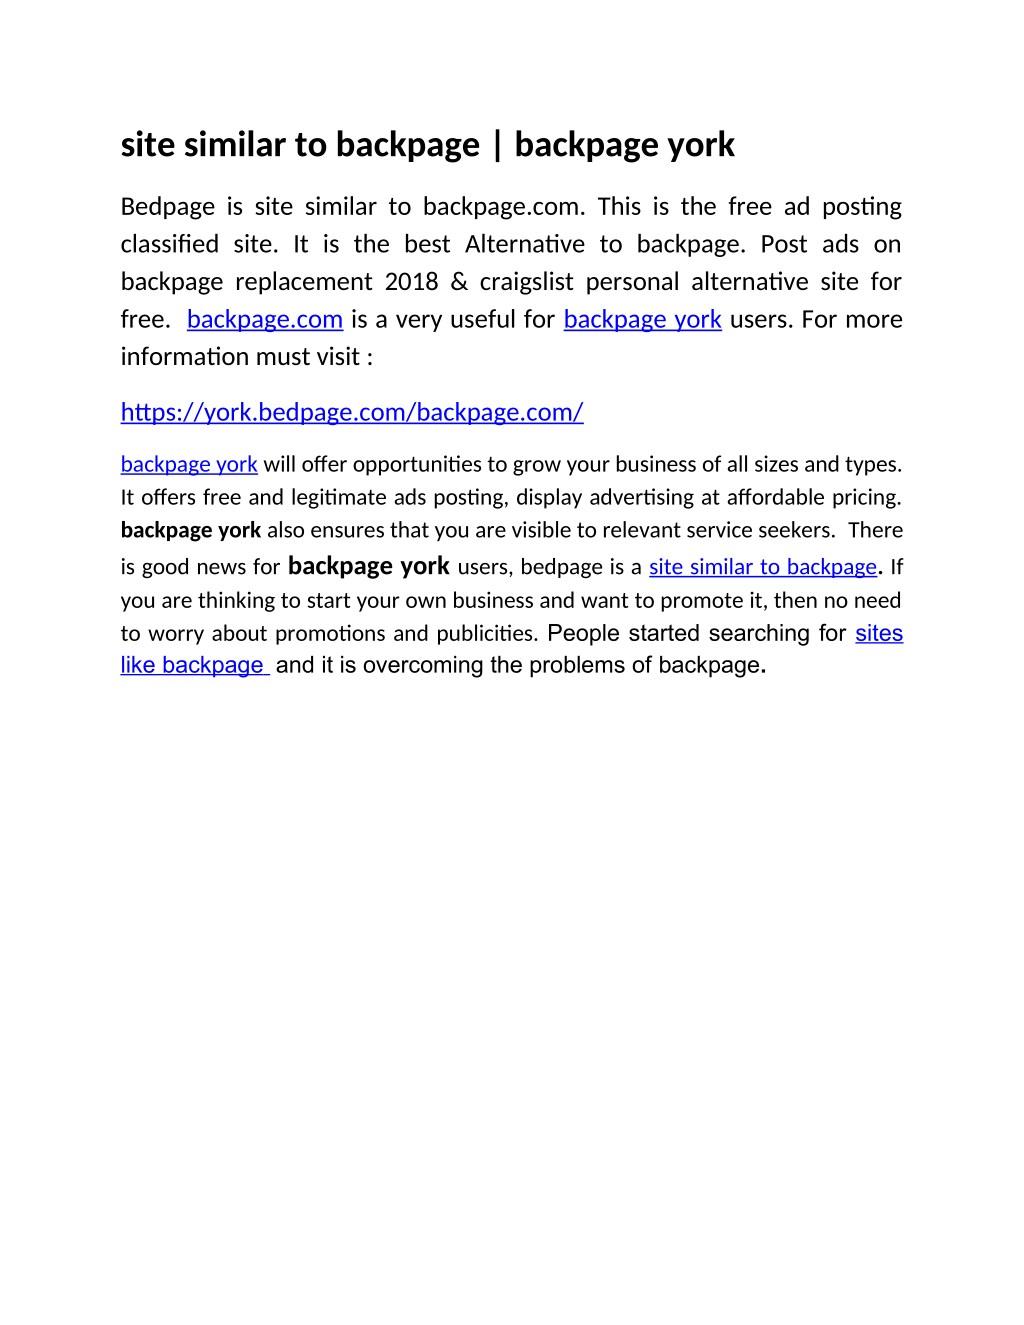 craigslist albany backpage